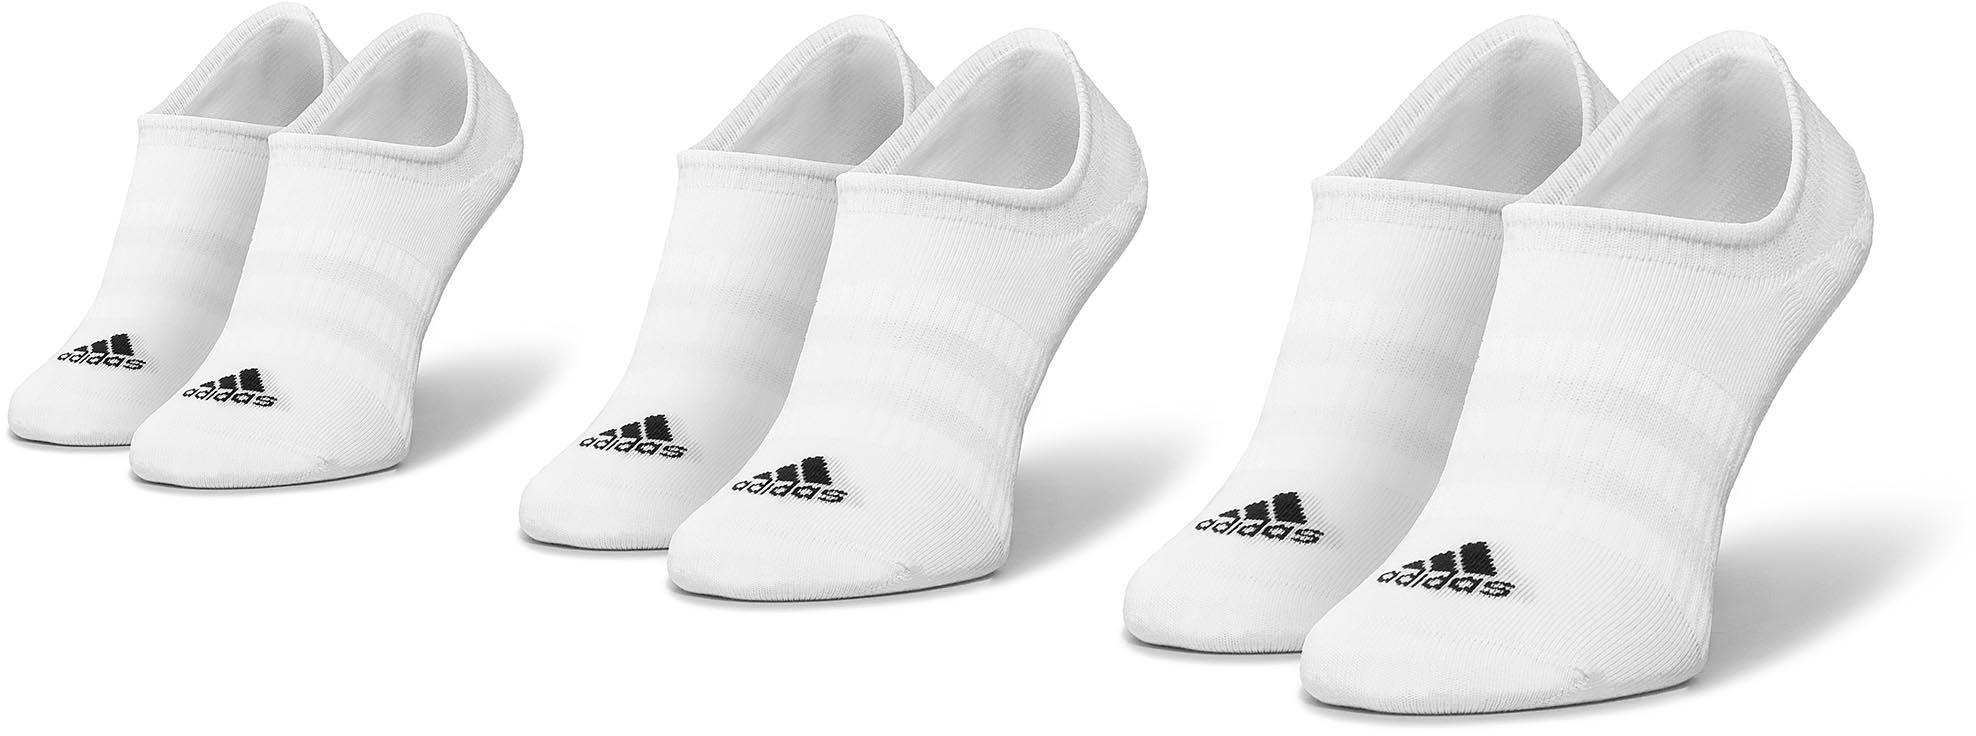 Zestaw 3 par stopek unisex adidas - Light Nosh 3PP DZ9414 White/White/White